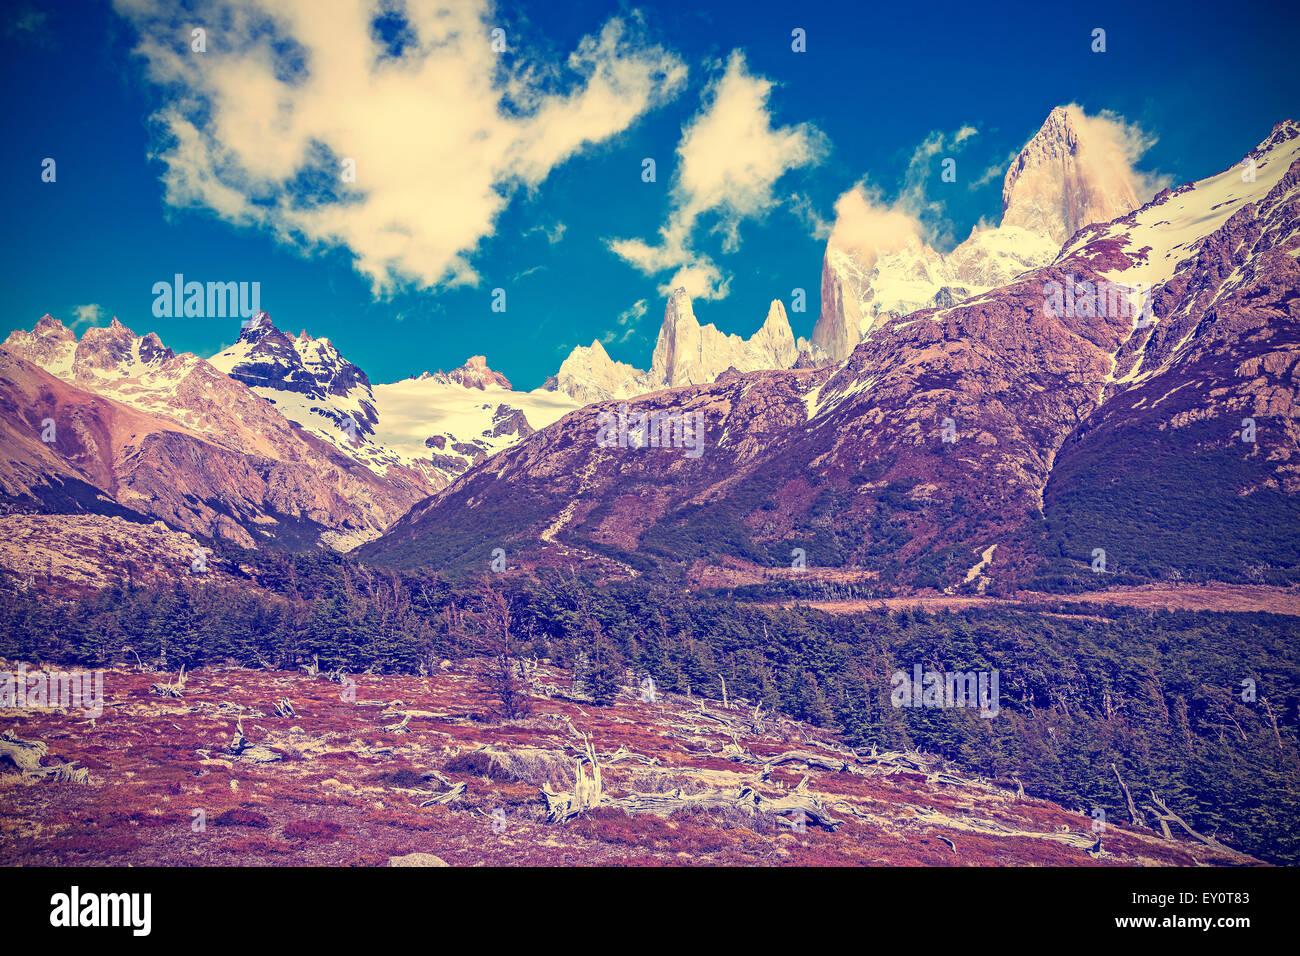 Vintage toned Fitz Roy Mountain Range, Argentina. - Stock Image